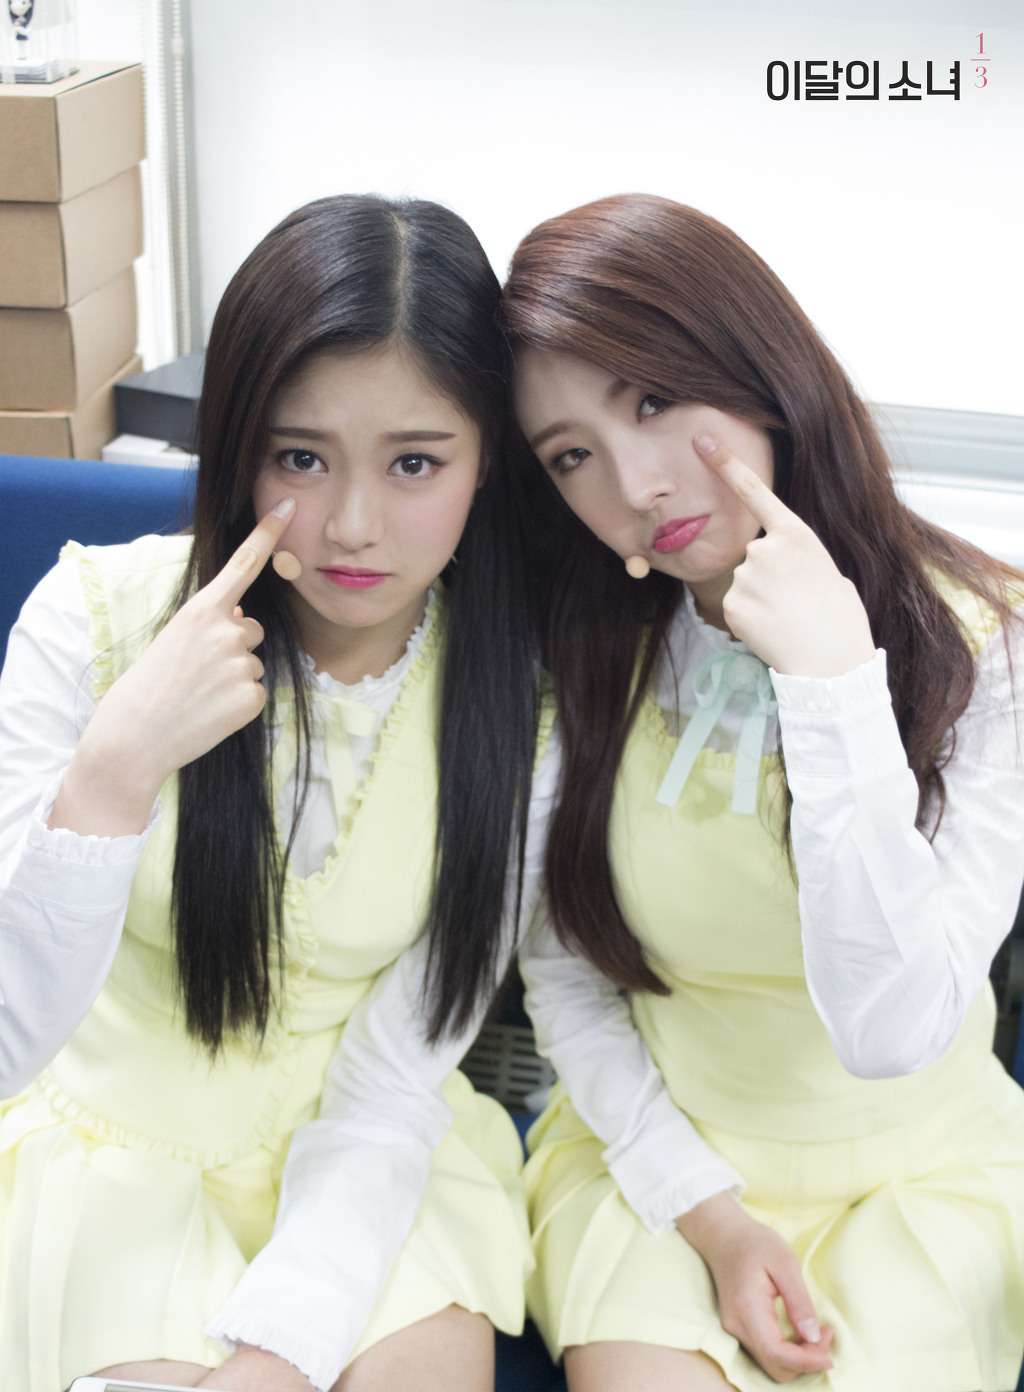 170312 SNS First Broadcast Diary HyunJin HaSeul 2.jpg